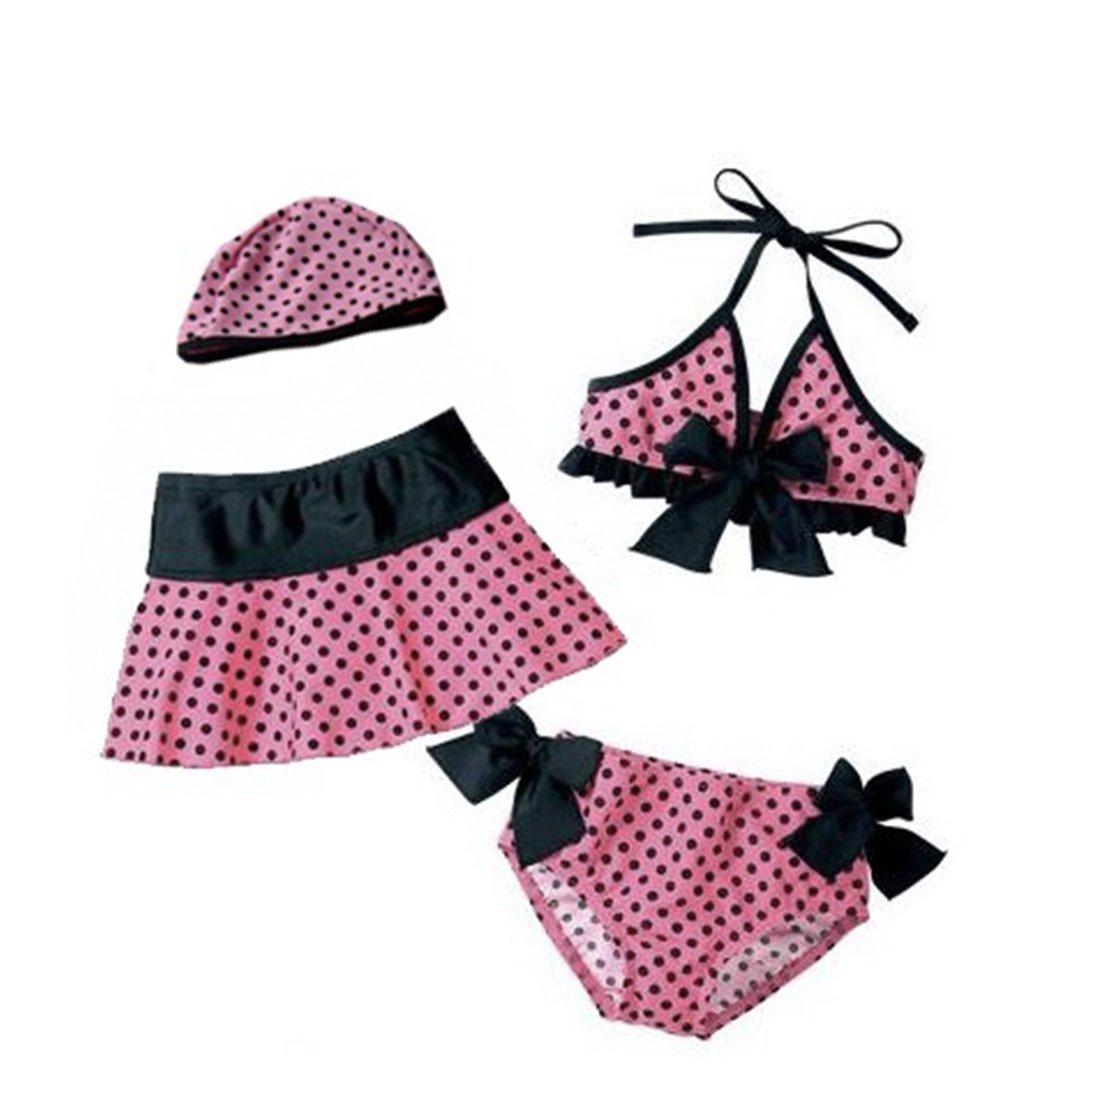 Pink Black Kids Baby Toddler Girls Swimwear Bikini Swimsuit Skirt Bather Hat 4 Piece